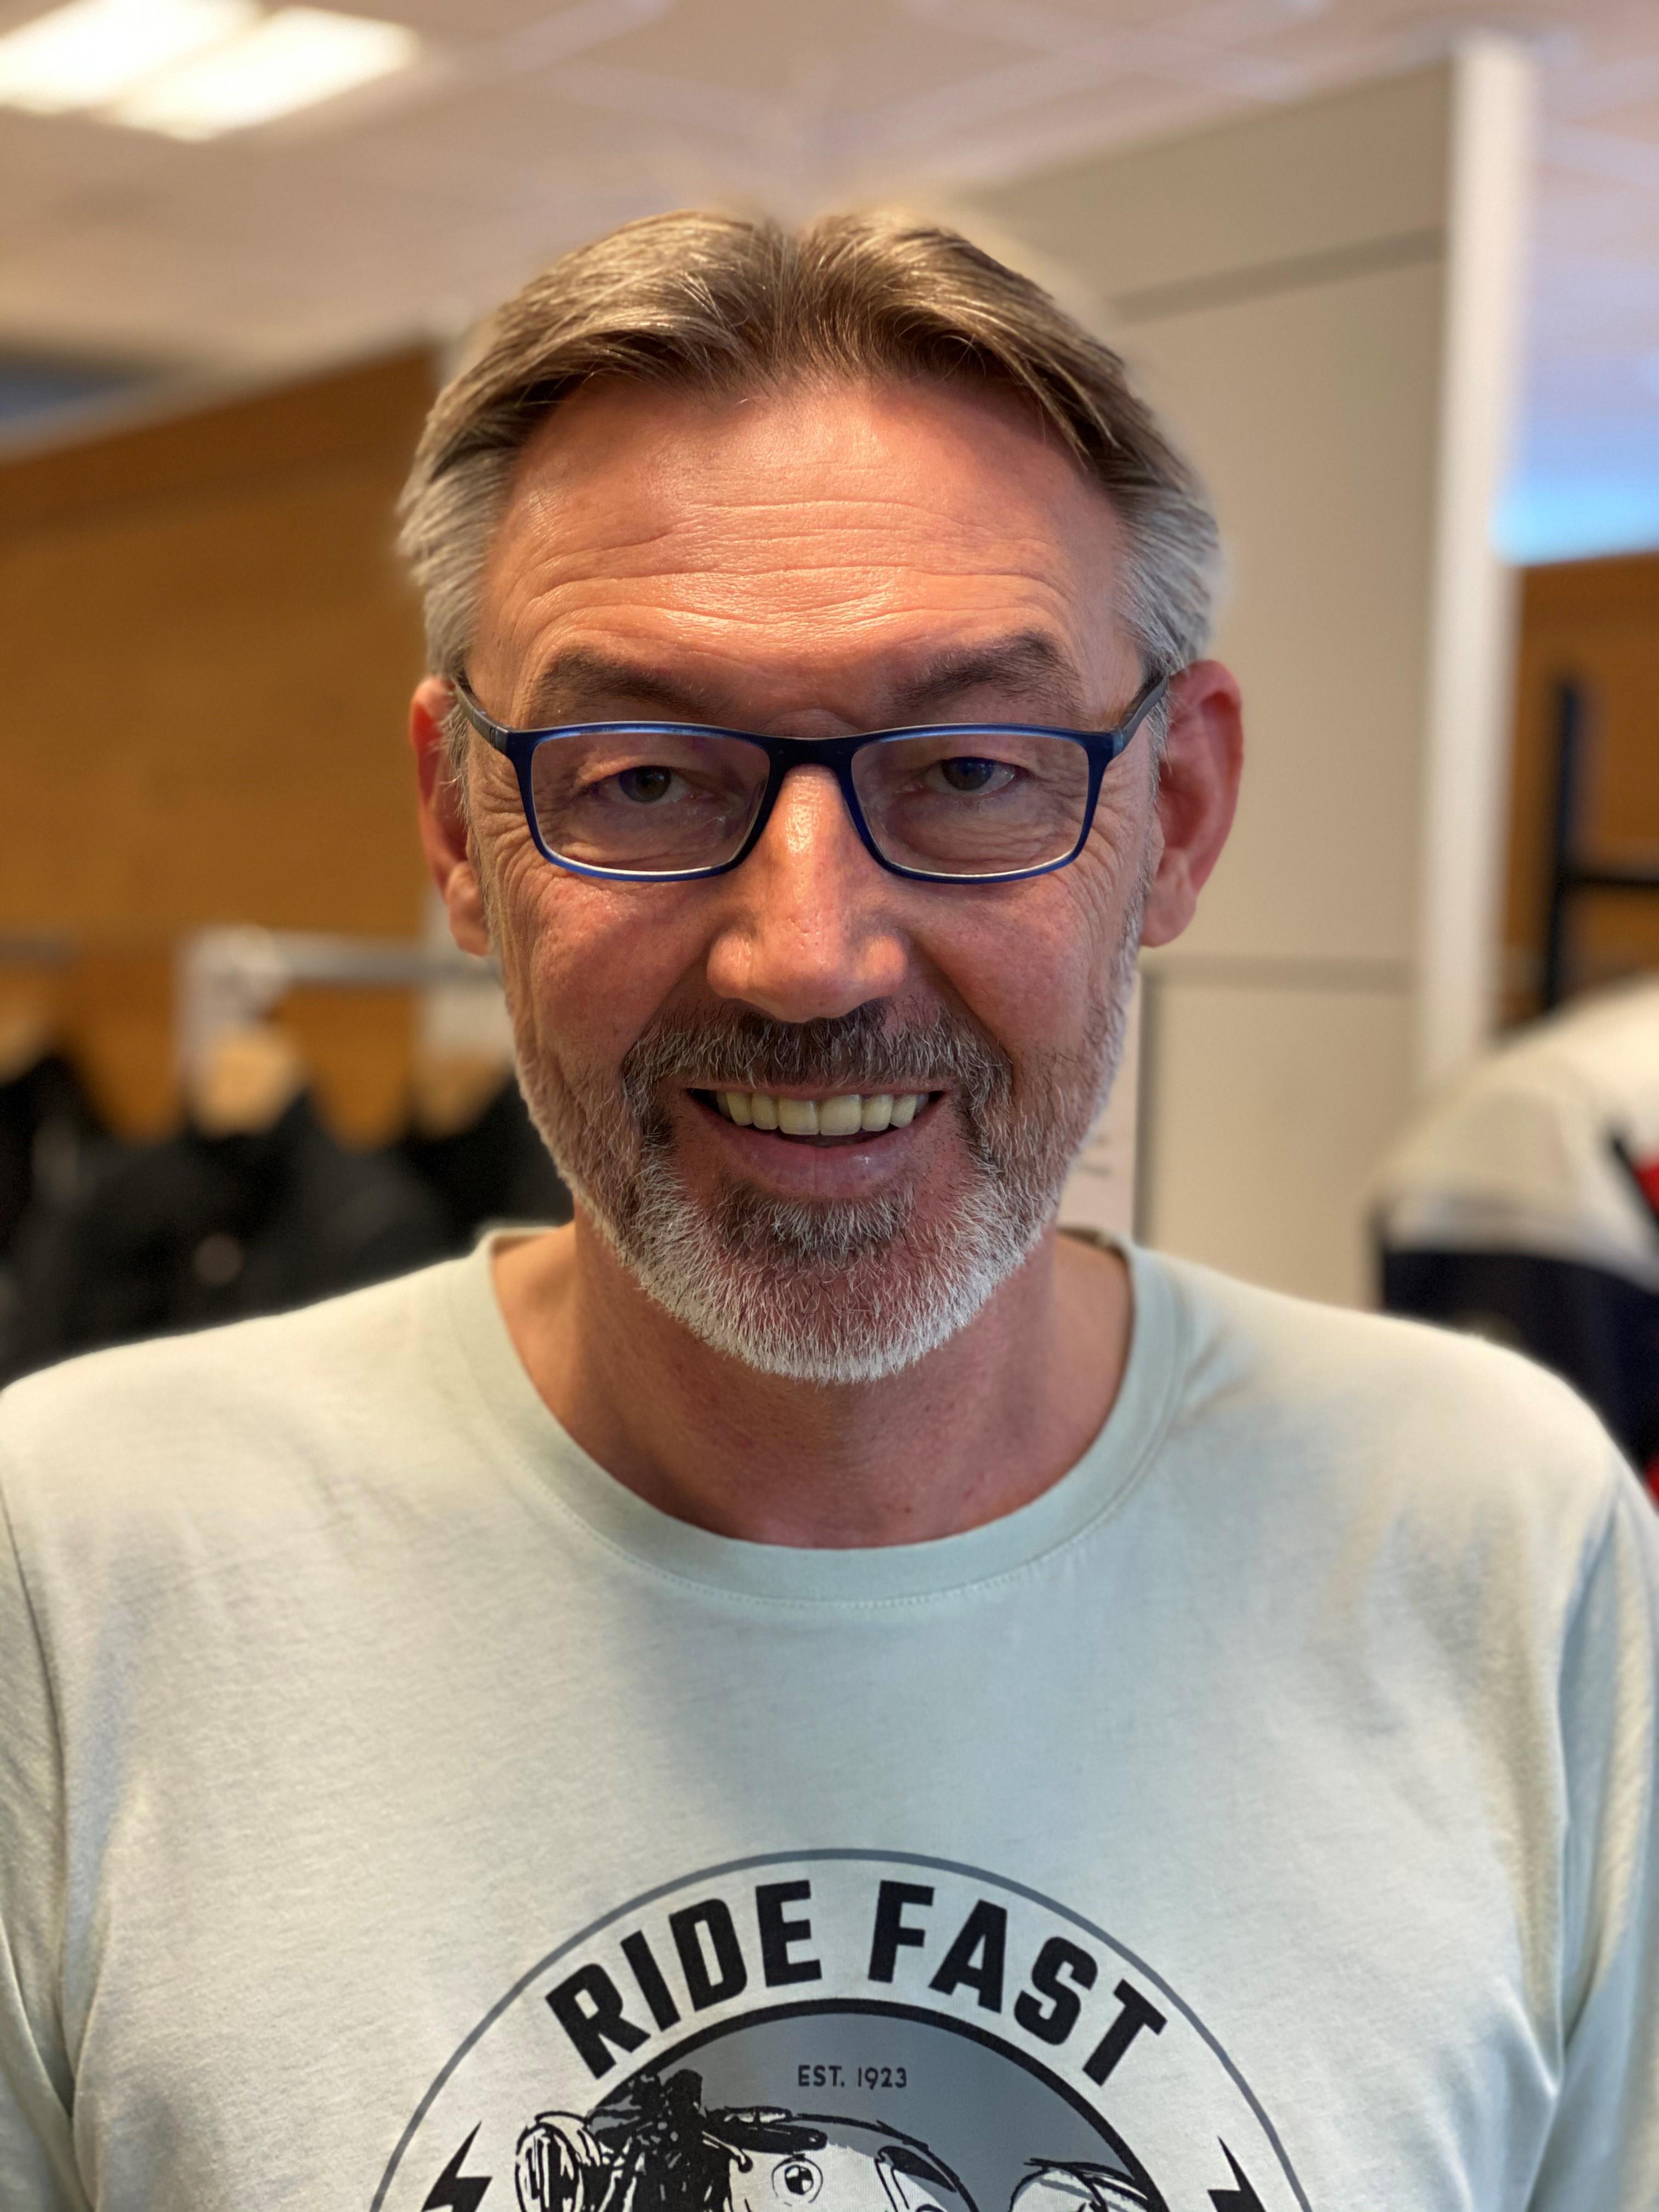 Peter D'Haese